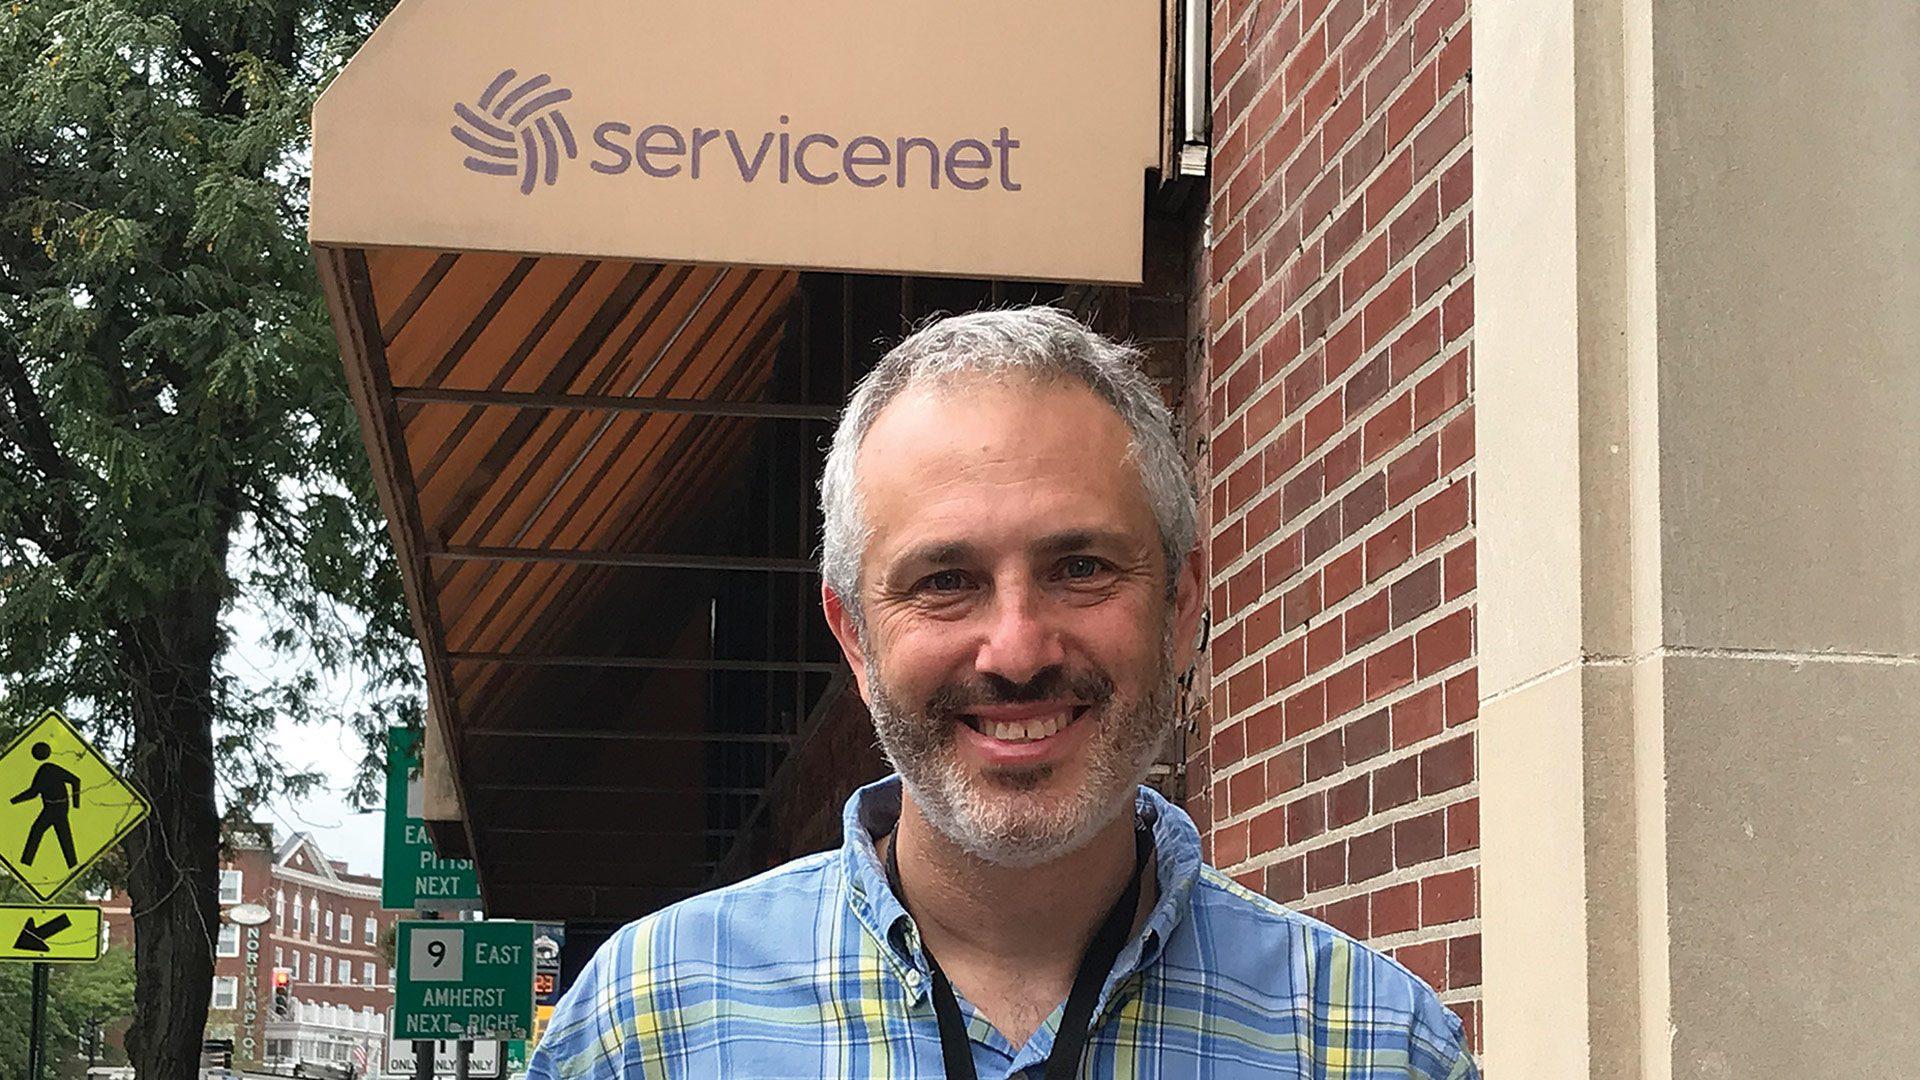 Dan Millman runs a program that helps people